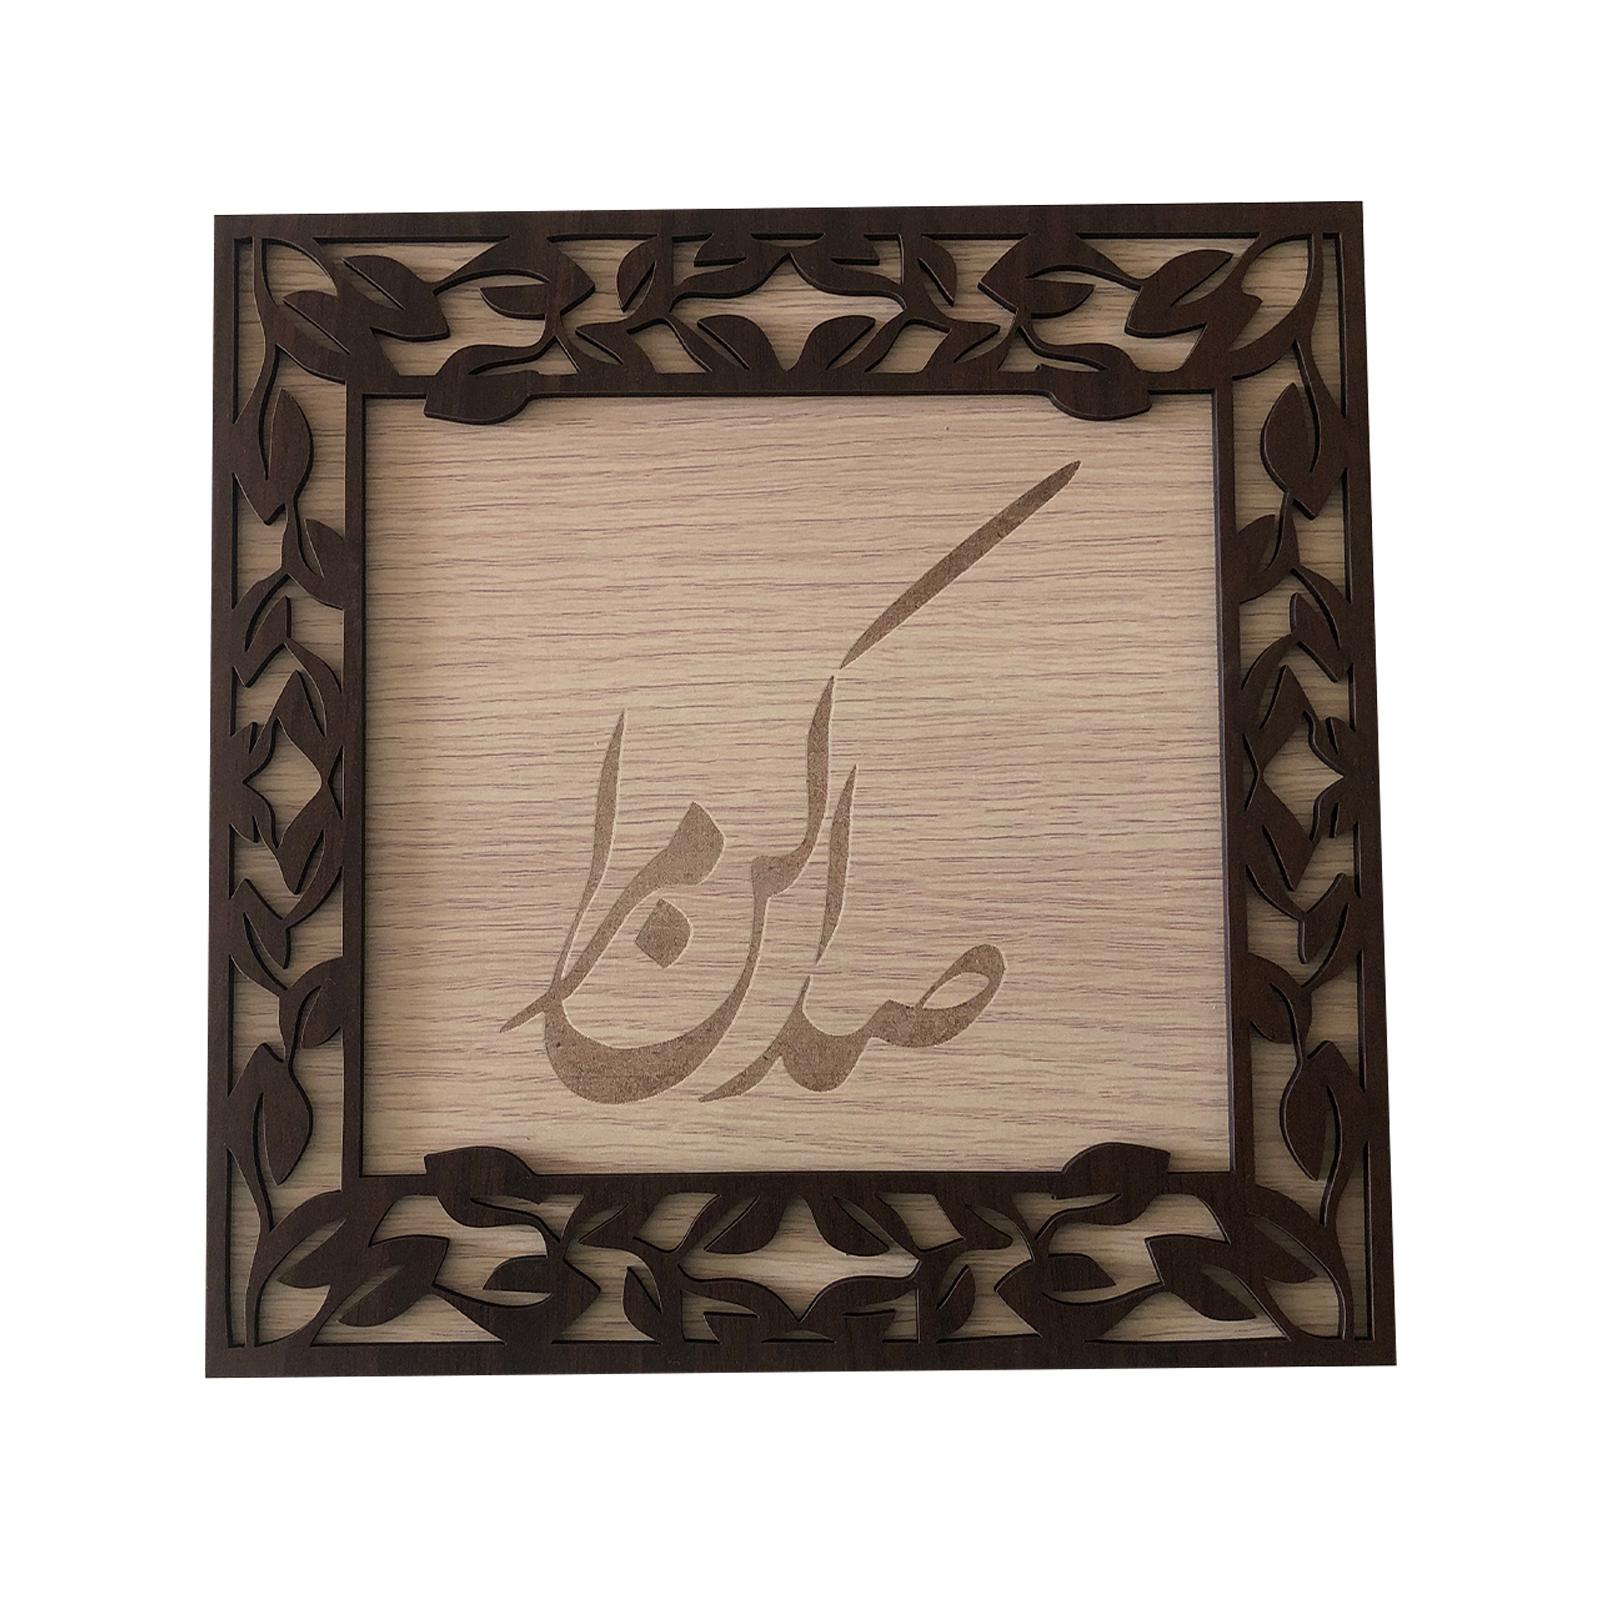 تابلو چوبی طرح صدا کن مرا مدل دل نوشته کد ta12